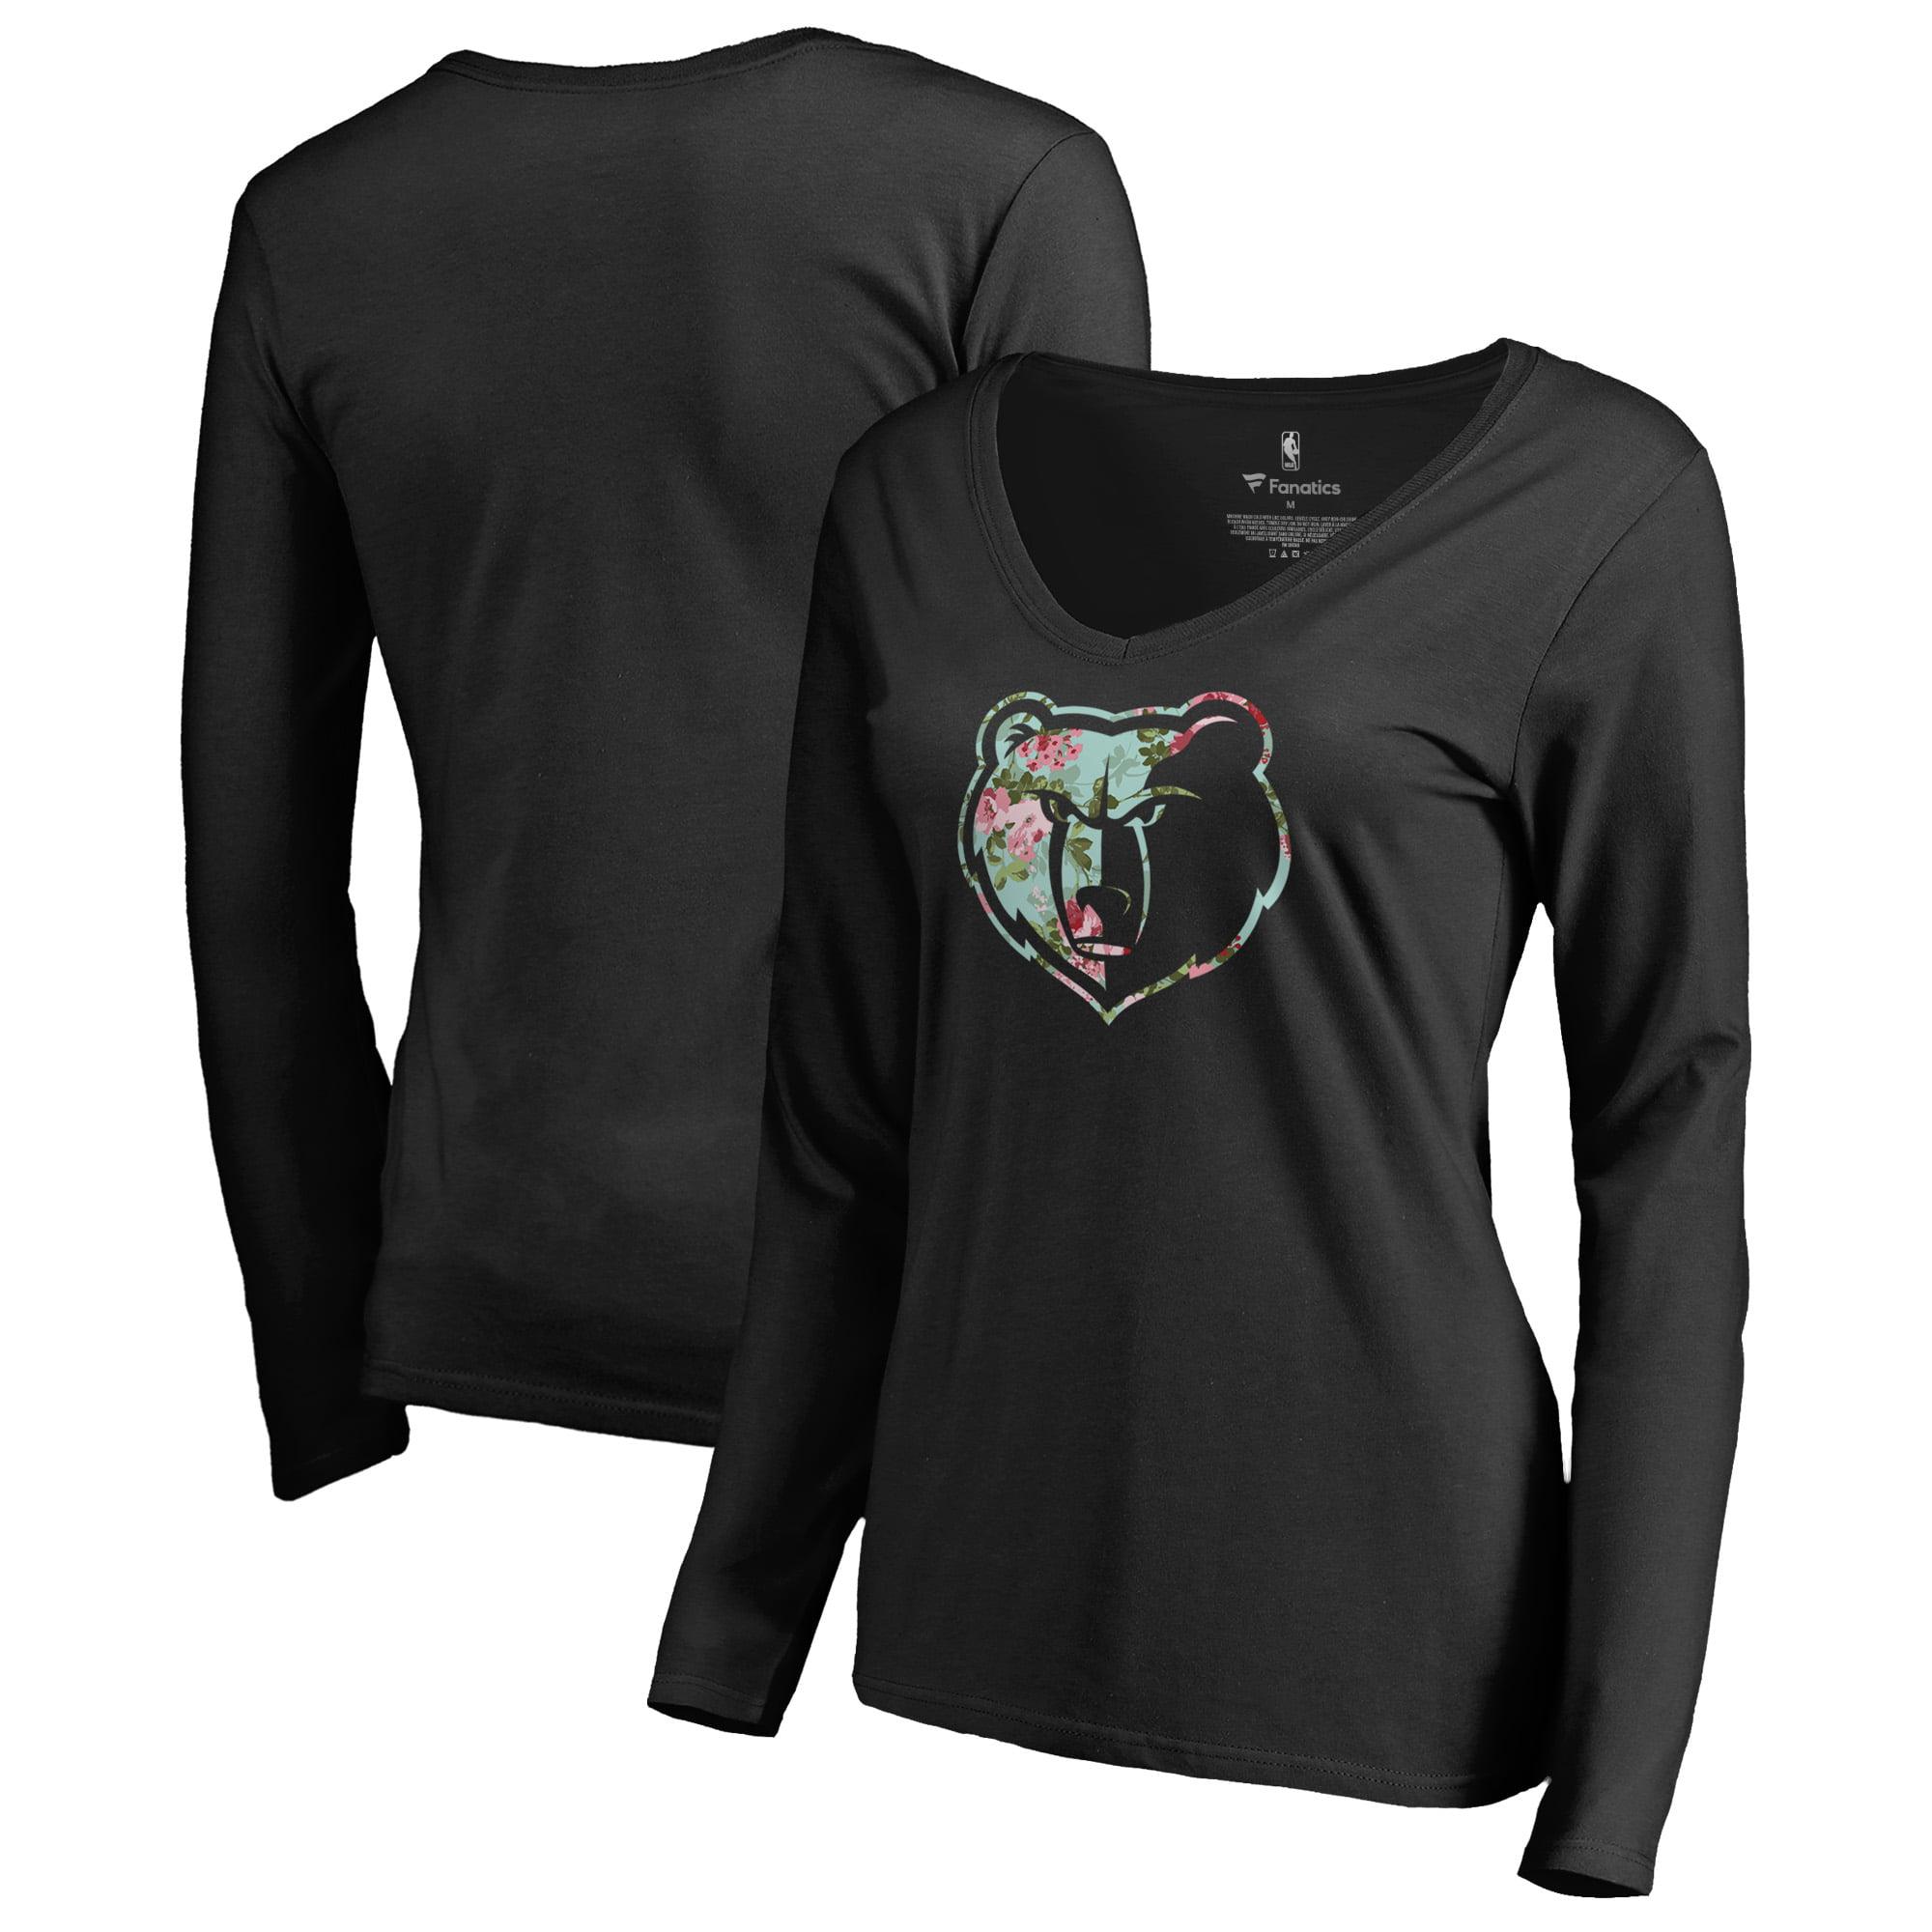 Memphis Grizzlies Fanatics Branded Women's Lovely Long Sleeve V-Neck T-Shirt - Black